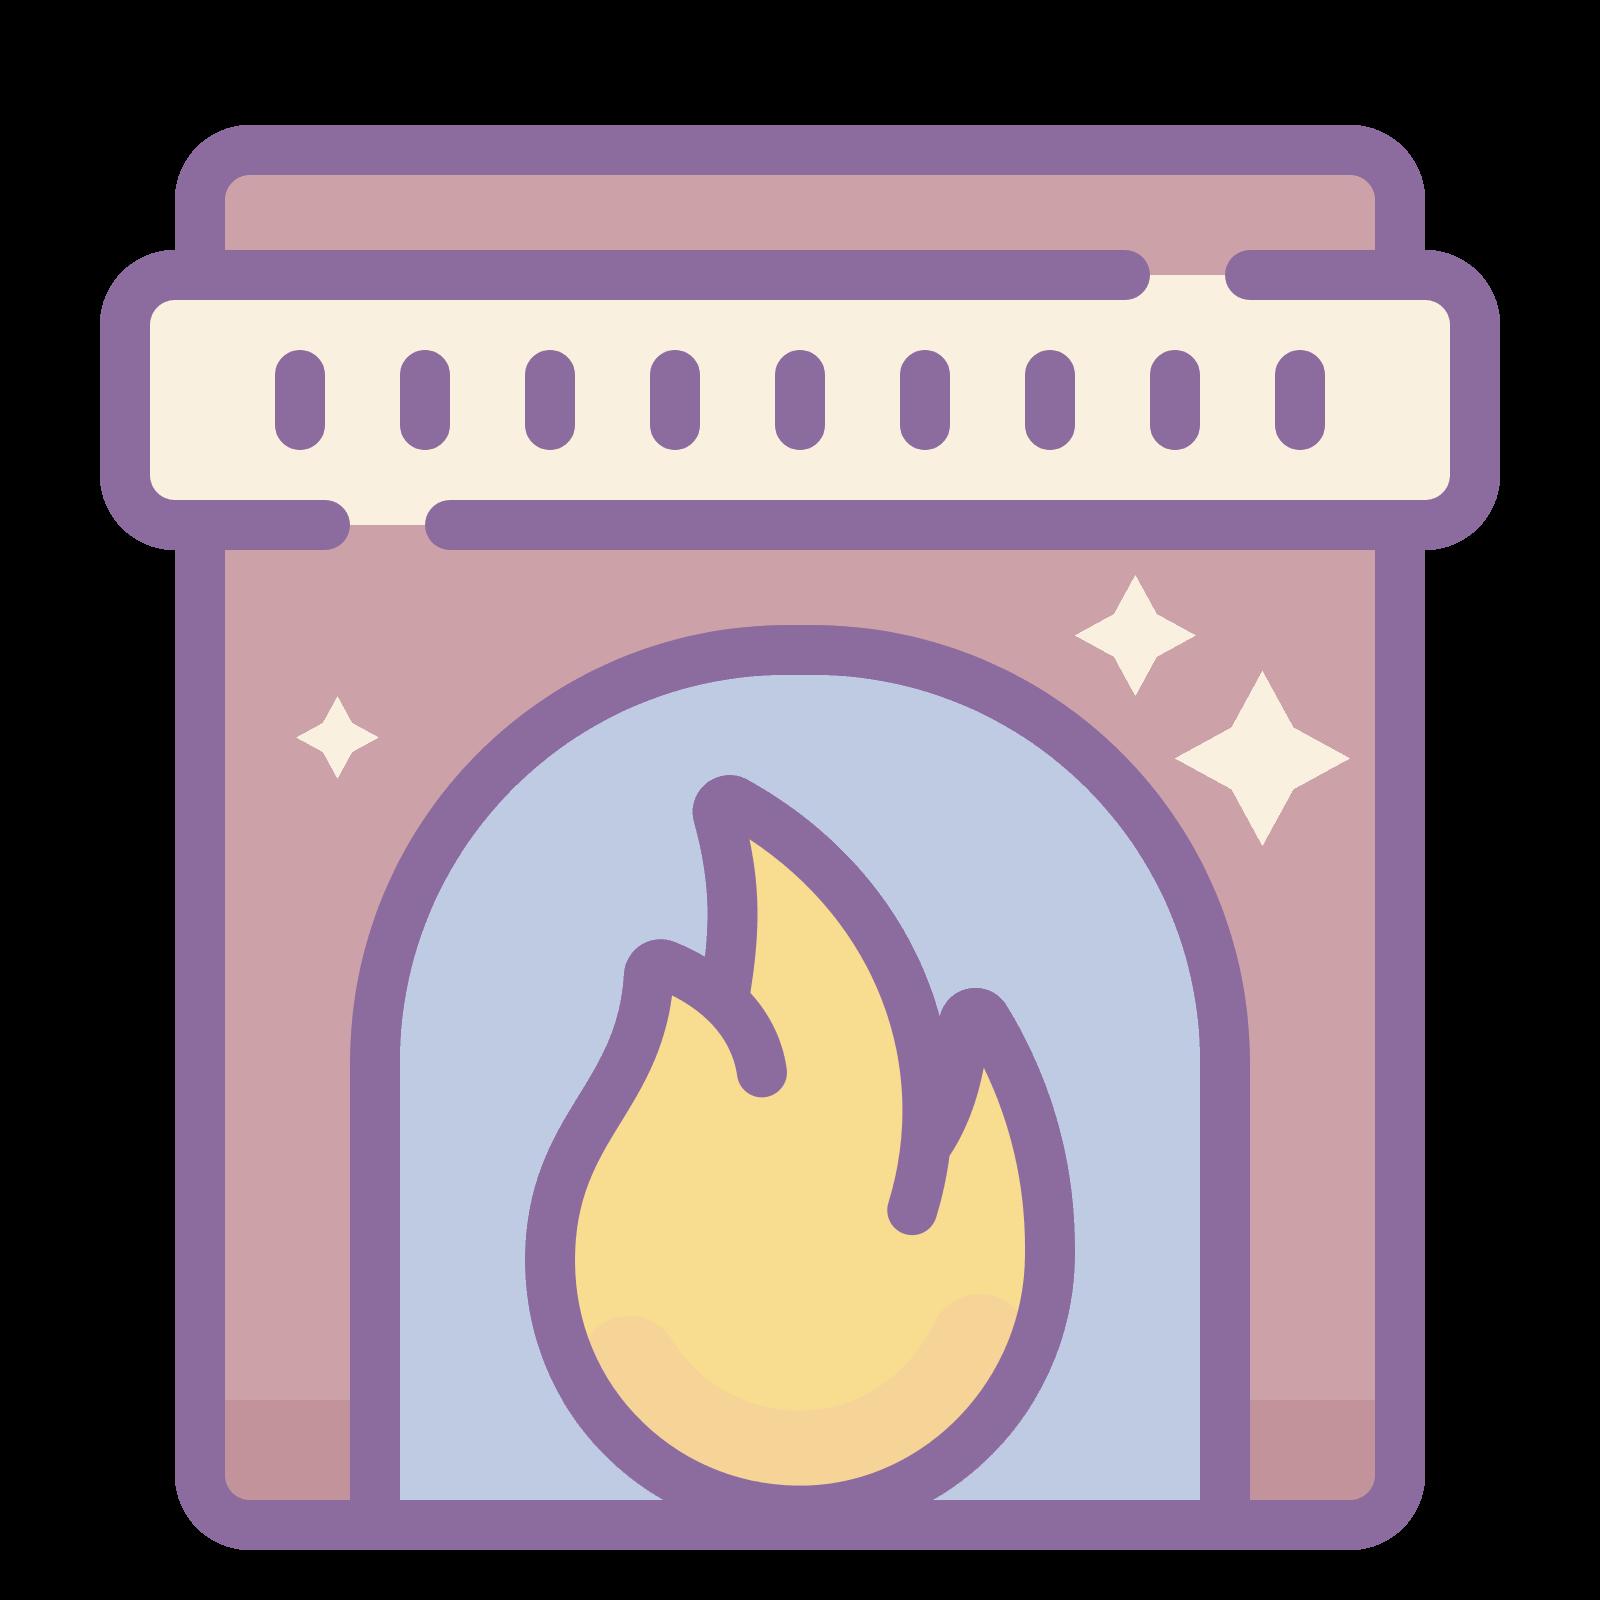 Cones download gratuito em. Fireplace clipart warm fire